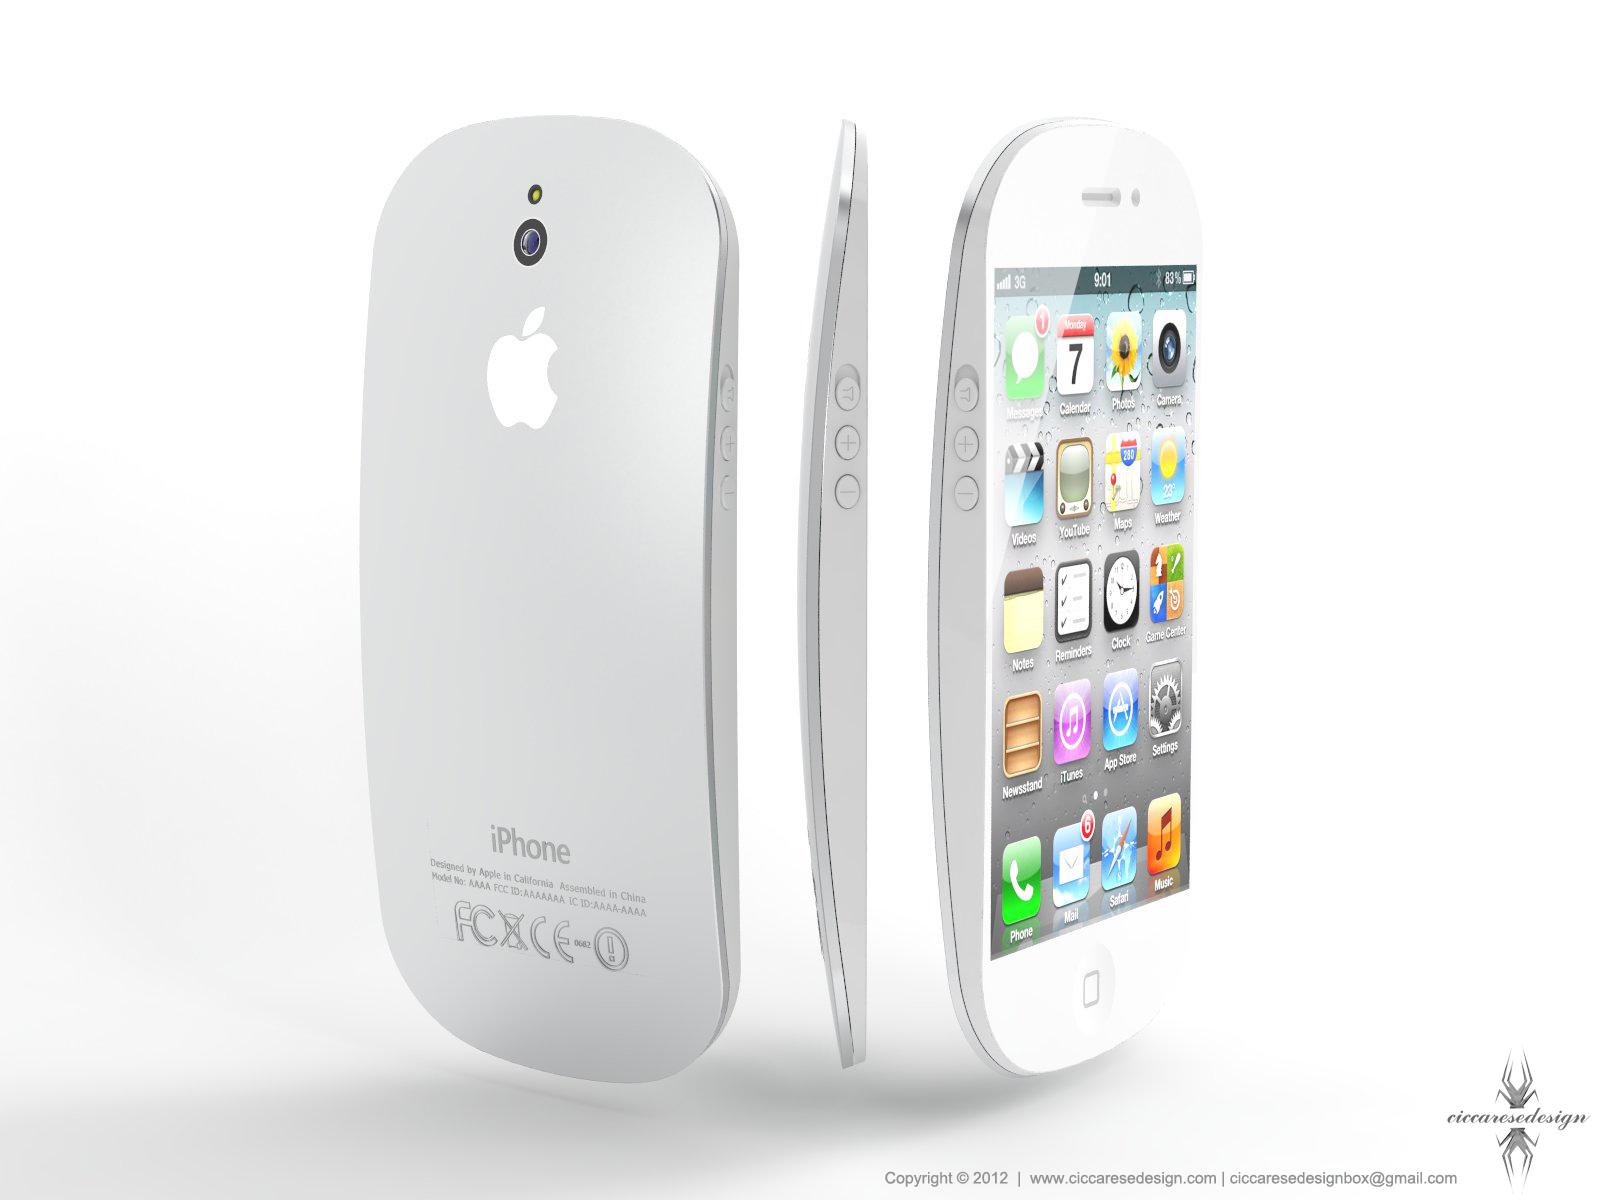 http://3.bp.blogspot.com/-1v7WbyWPRZ4/T-RYKI9bGCI/AAAAAAAAAOQ/eEUZ2cUPFjc/s1600/iphone%205%20kjhjtes.jpg